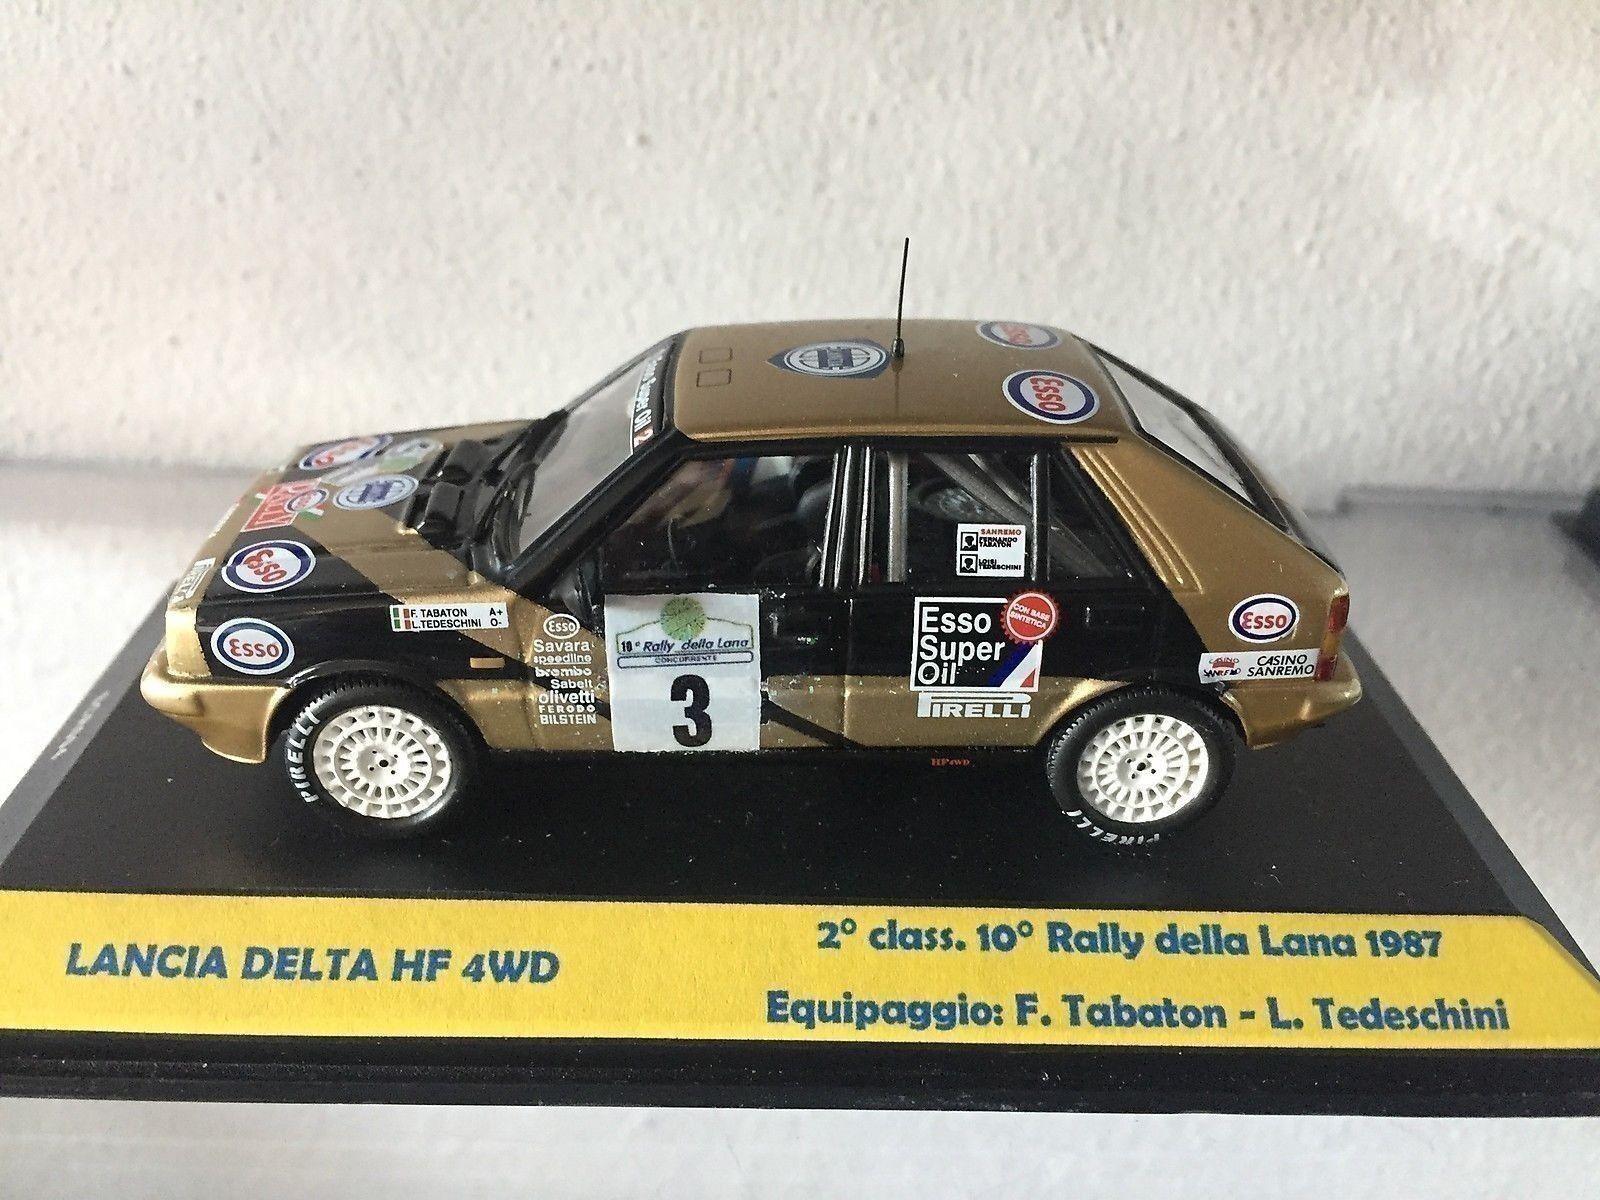 145 Lancia Delta 4WD  3 2° cl. 10° 10° 10° Rally dlla Lana 1987 Tabaton - IXO M. 1 43 4cd5df